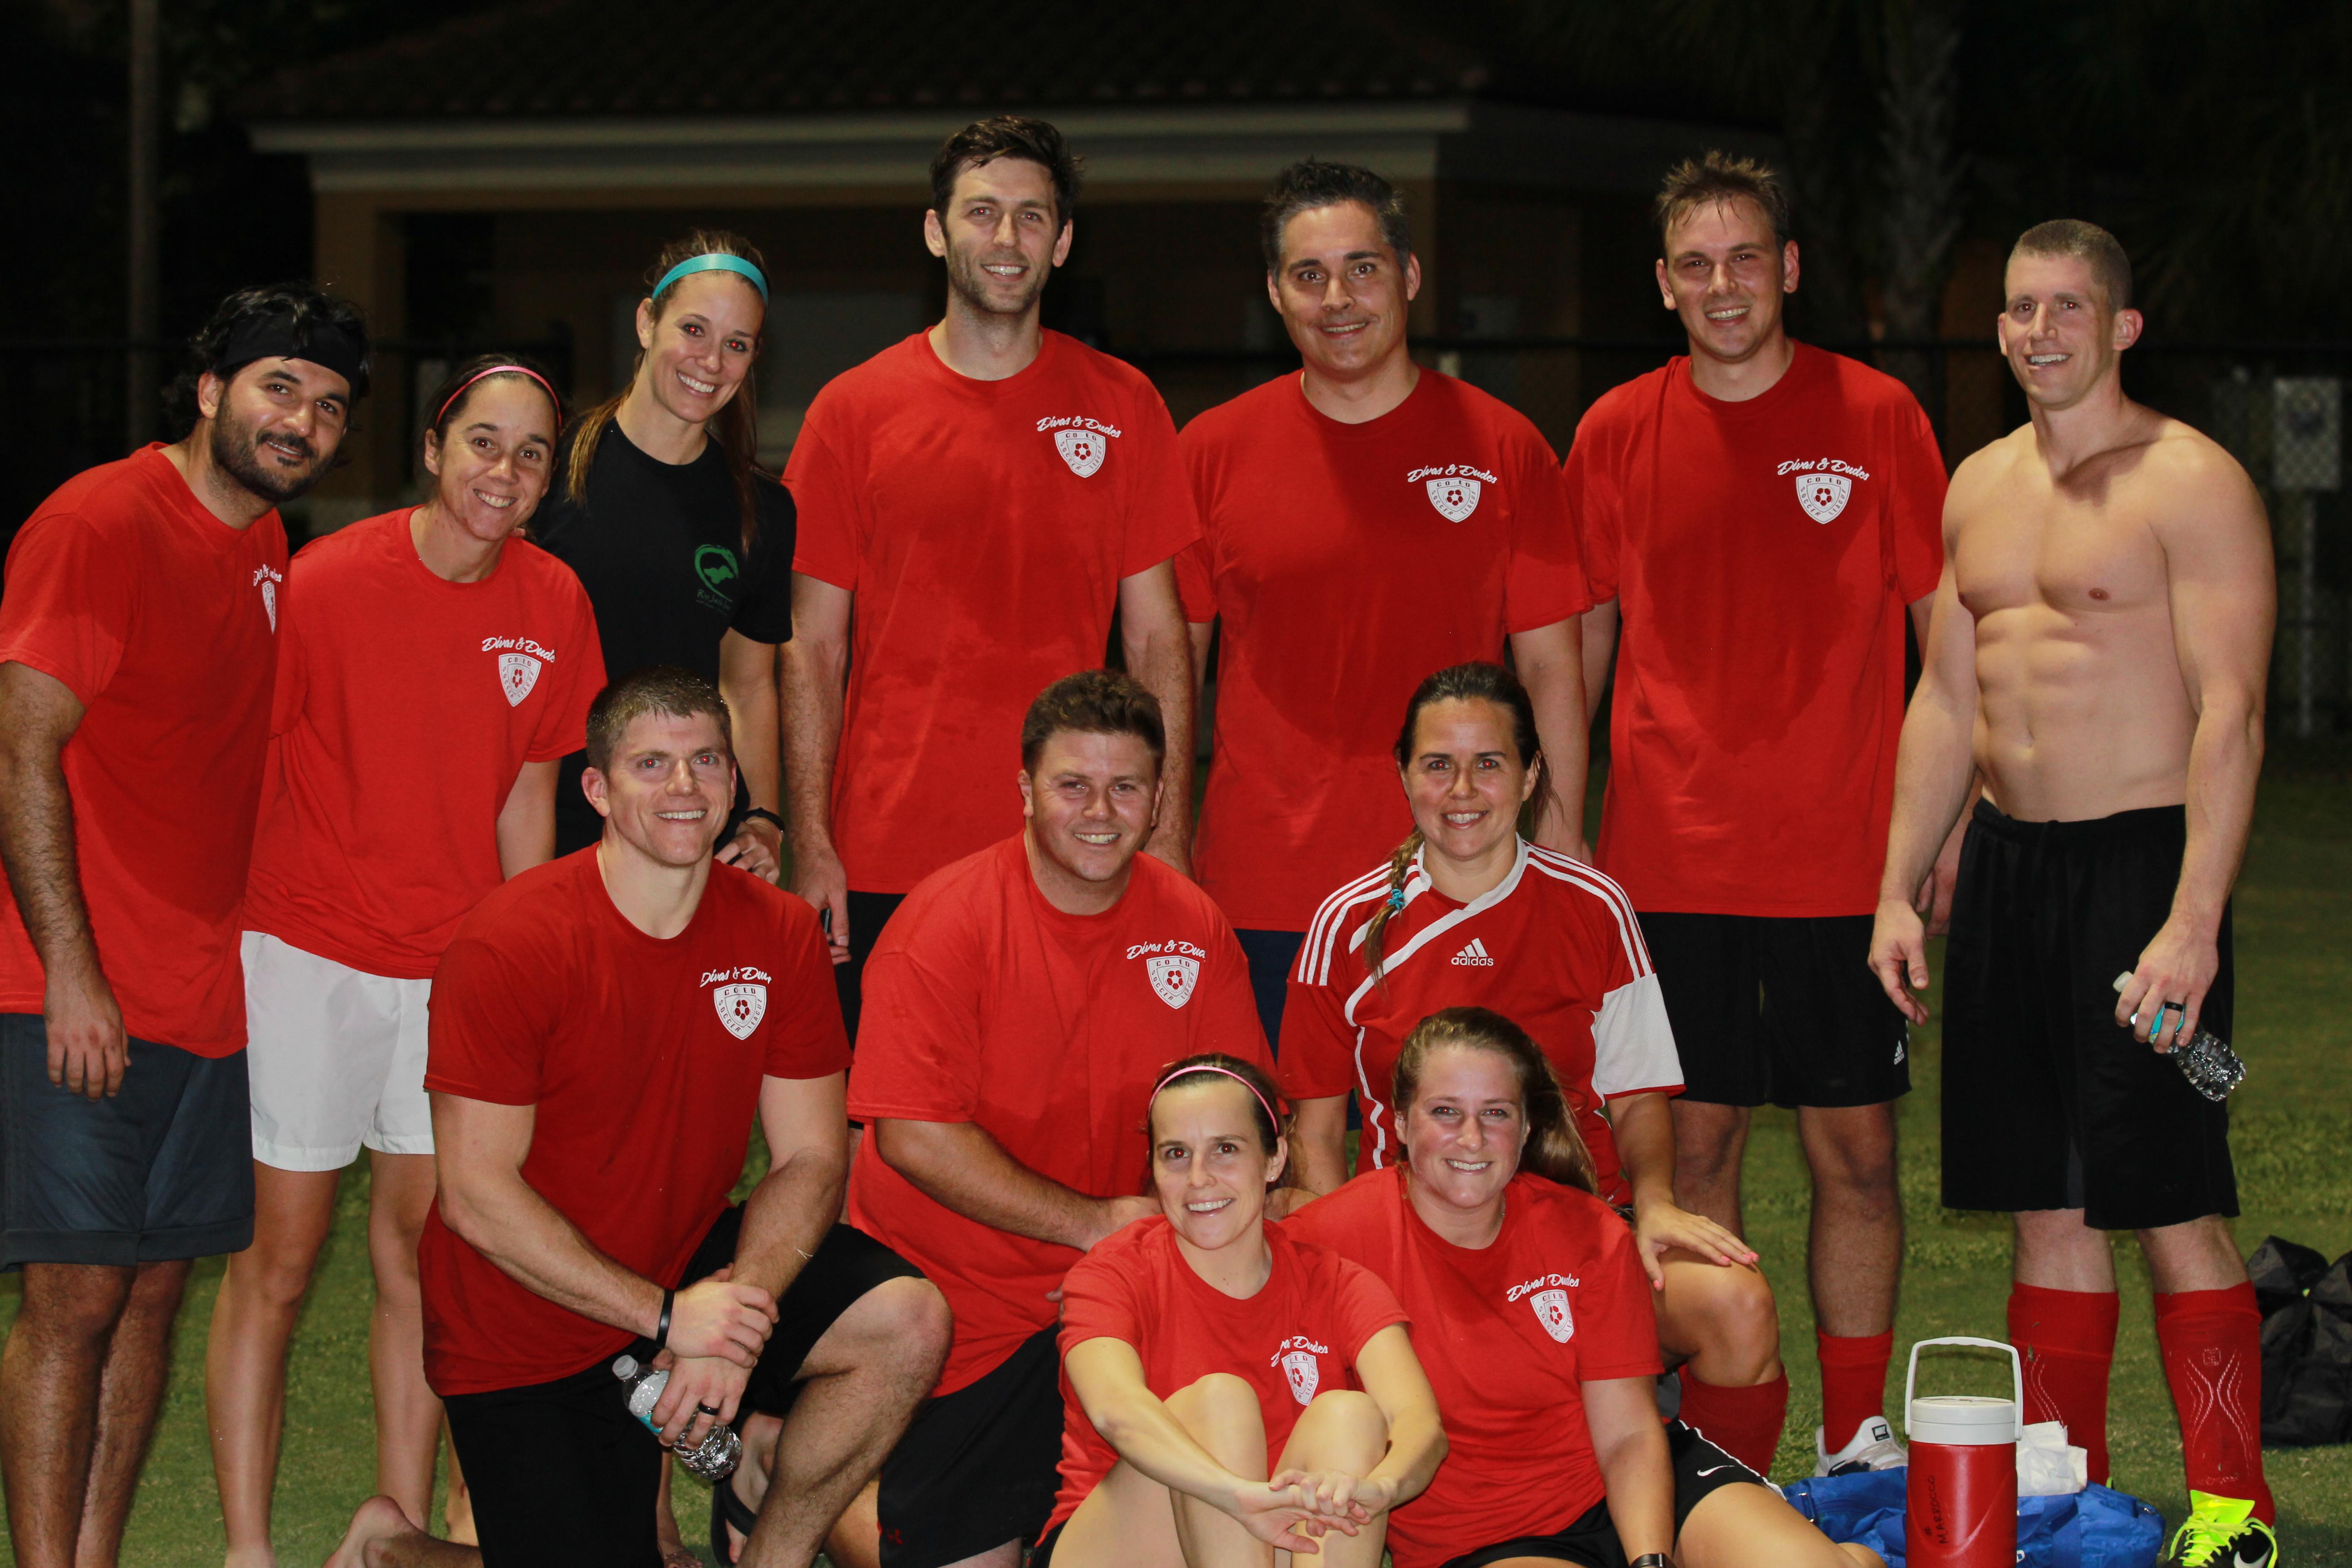 Co-Ed Palm Beach CrossFit